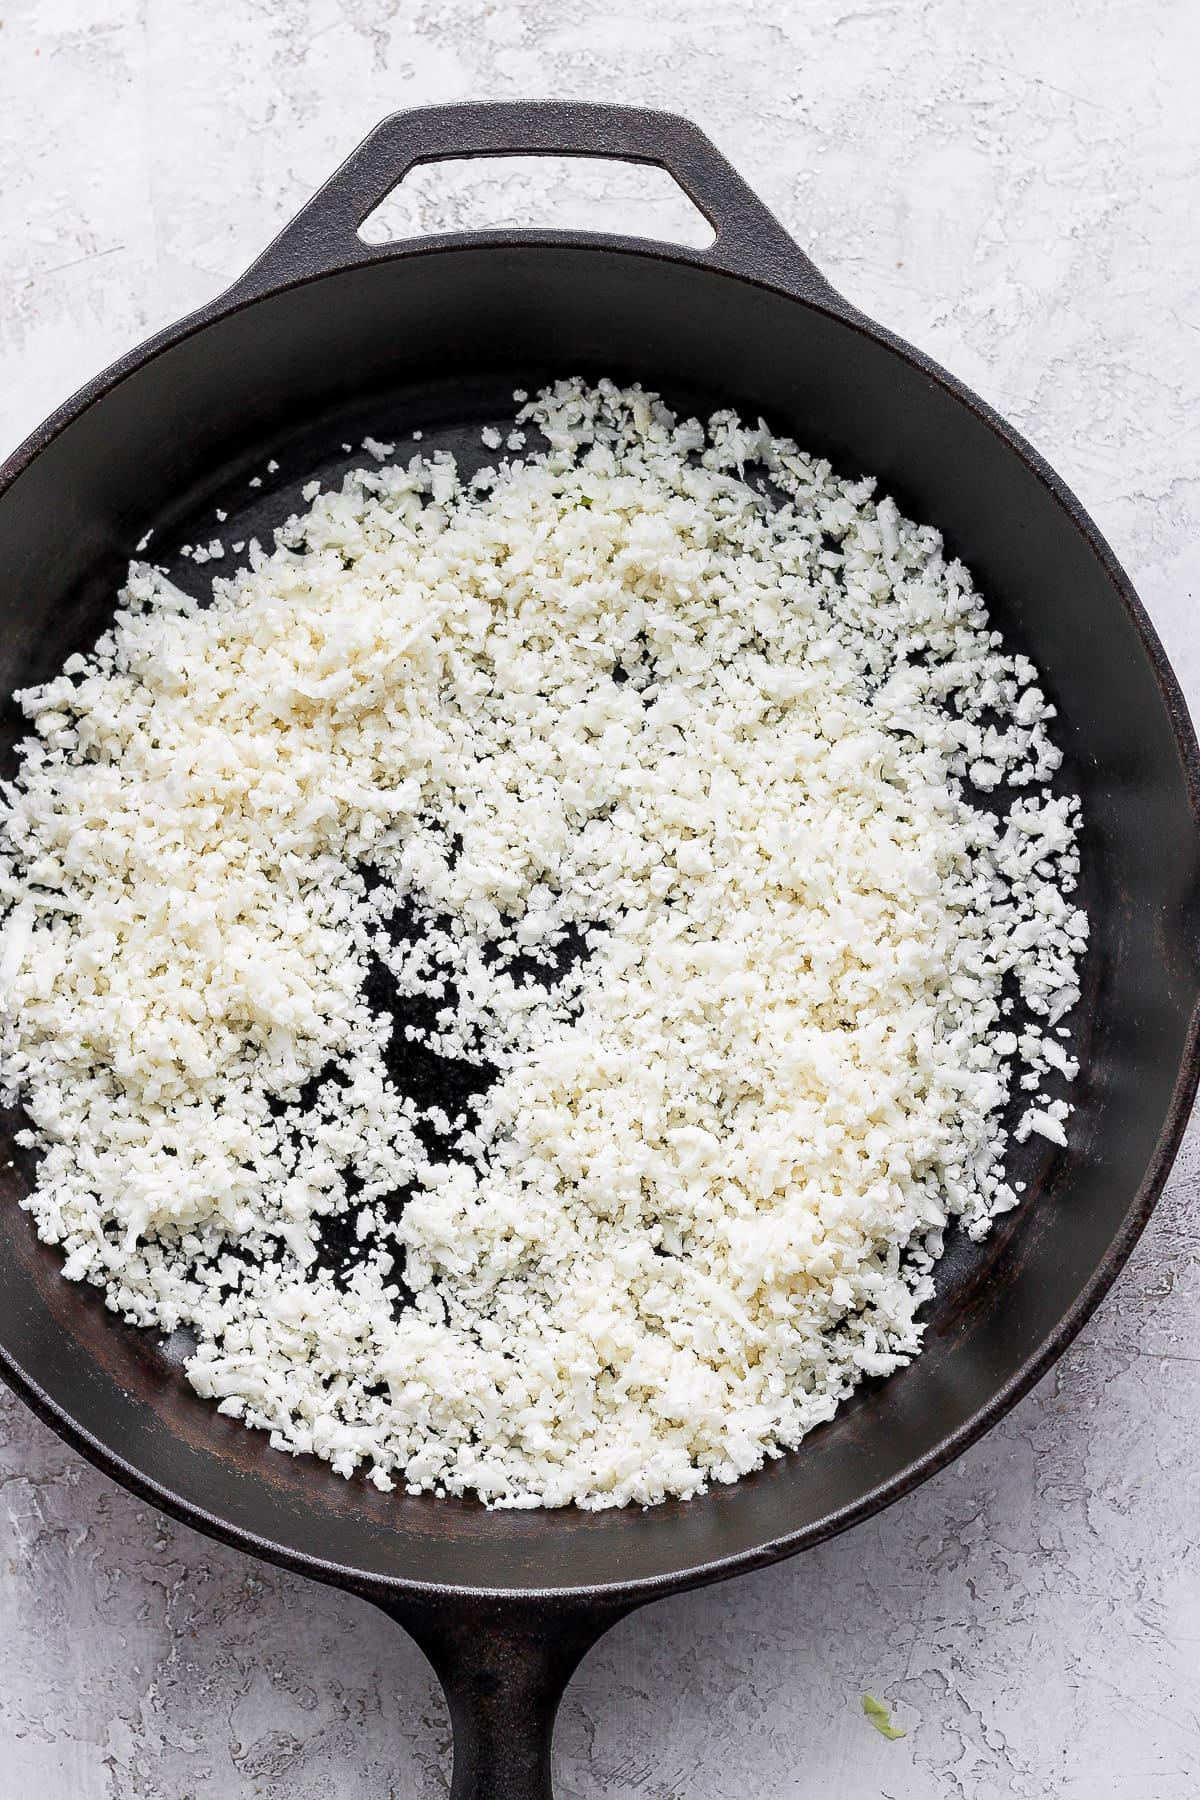 Cauliflower rice in a cast iron skillet.